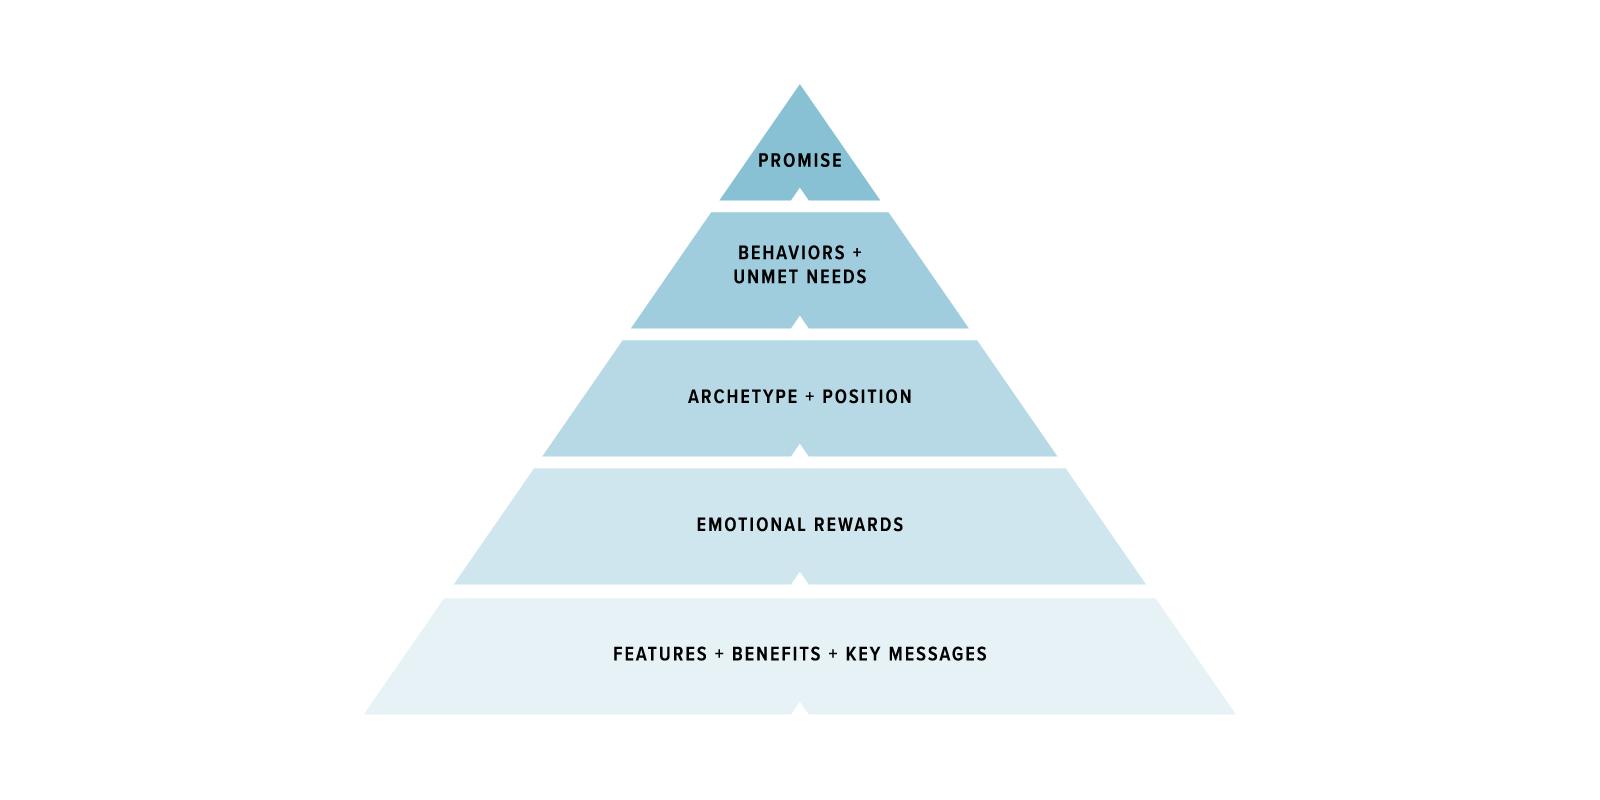 Brand Architecture Pyramid